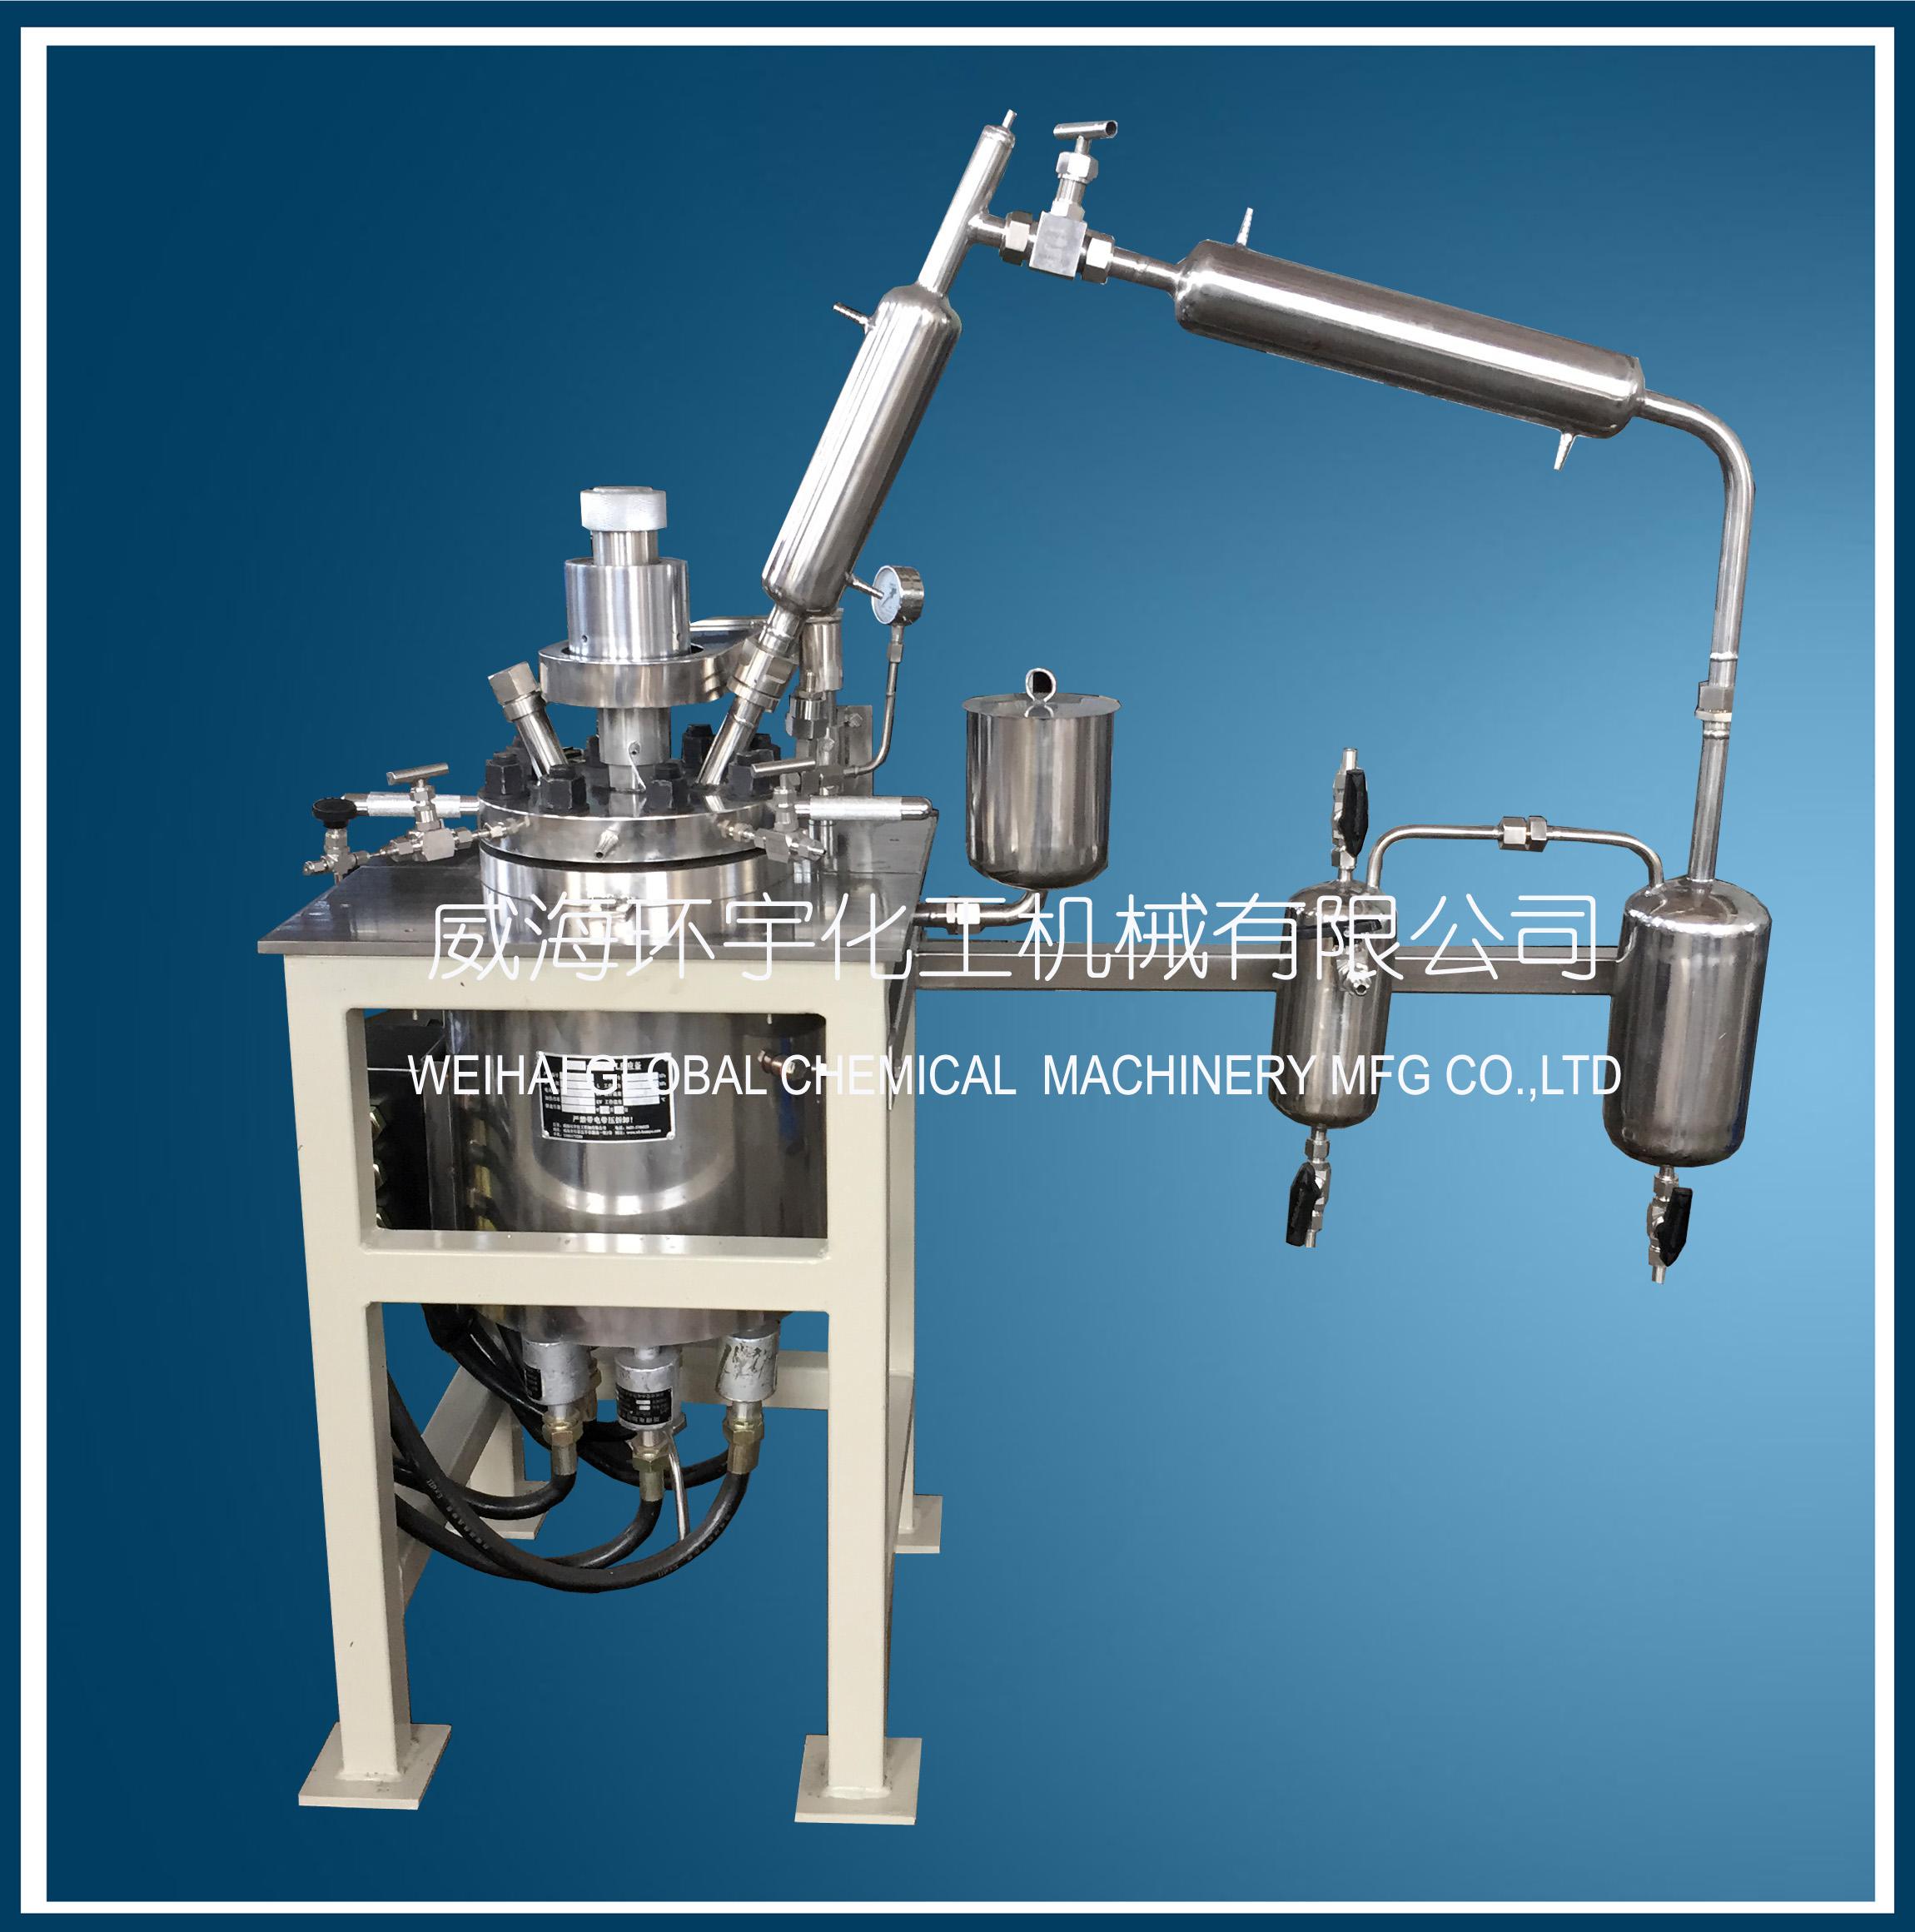 5L蒸馏反应釜已顺利完工发往唐山客户处